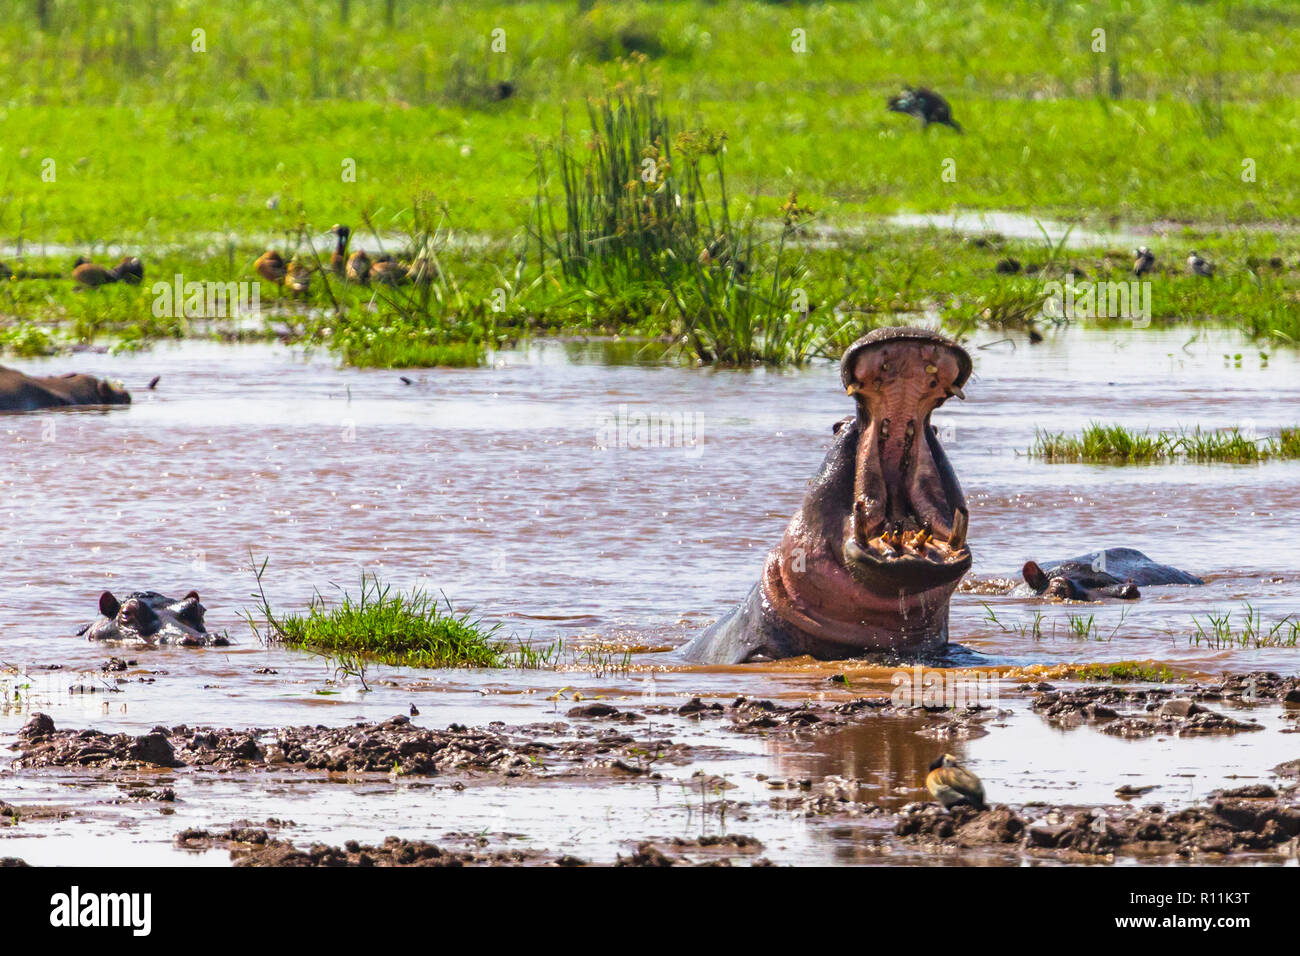 Hippopotamus. Lake Manyara National Reserve Tanzania. - Stock Image